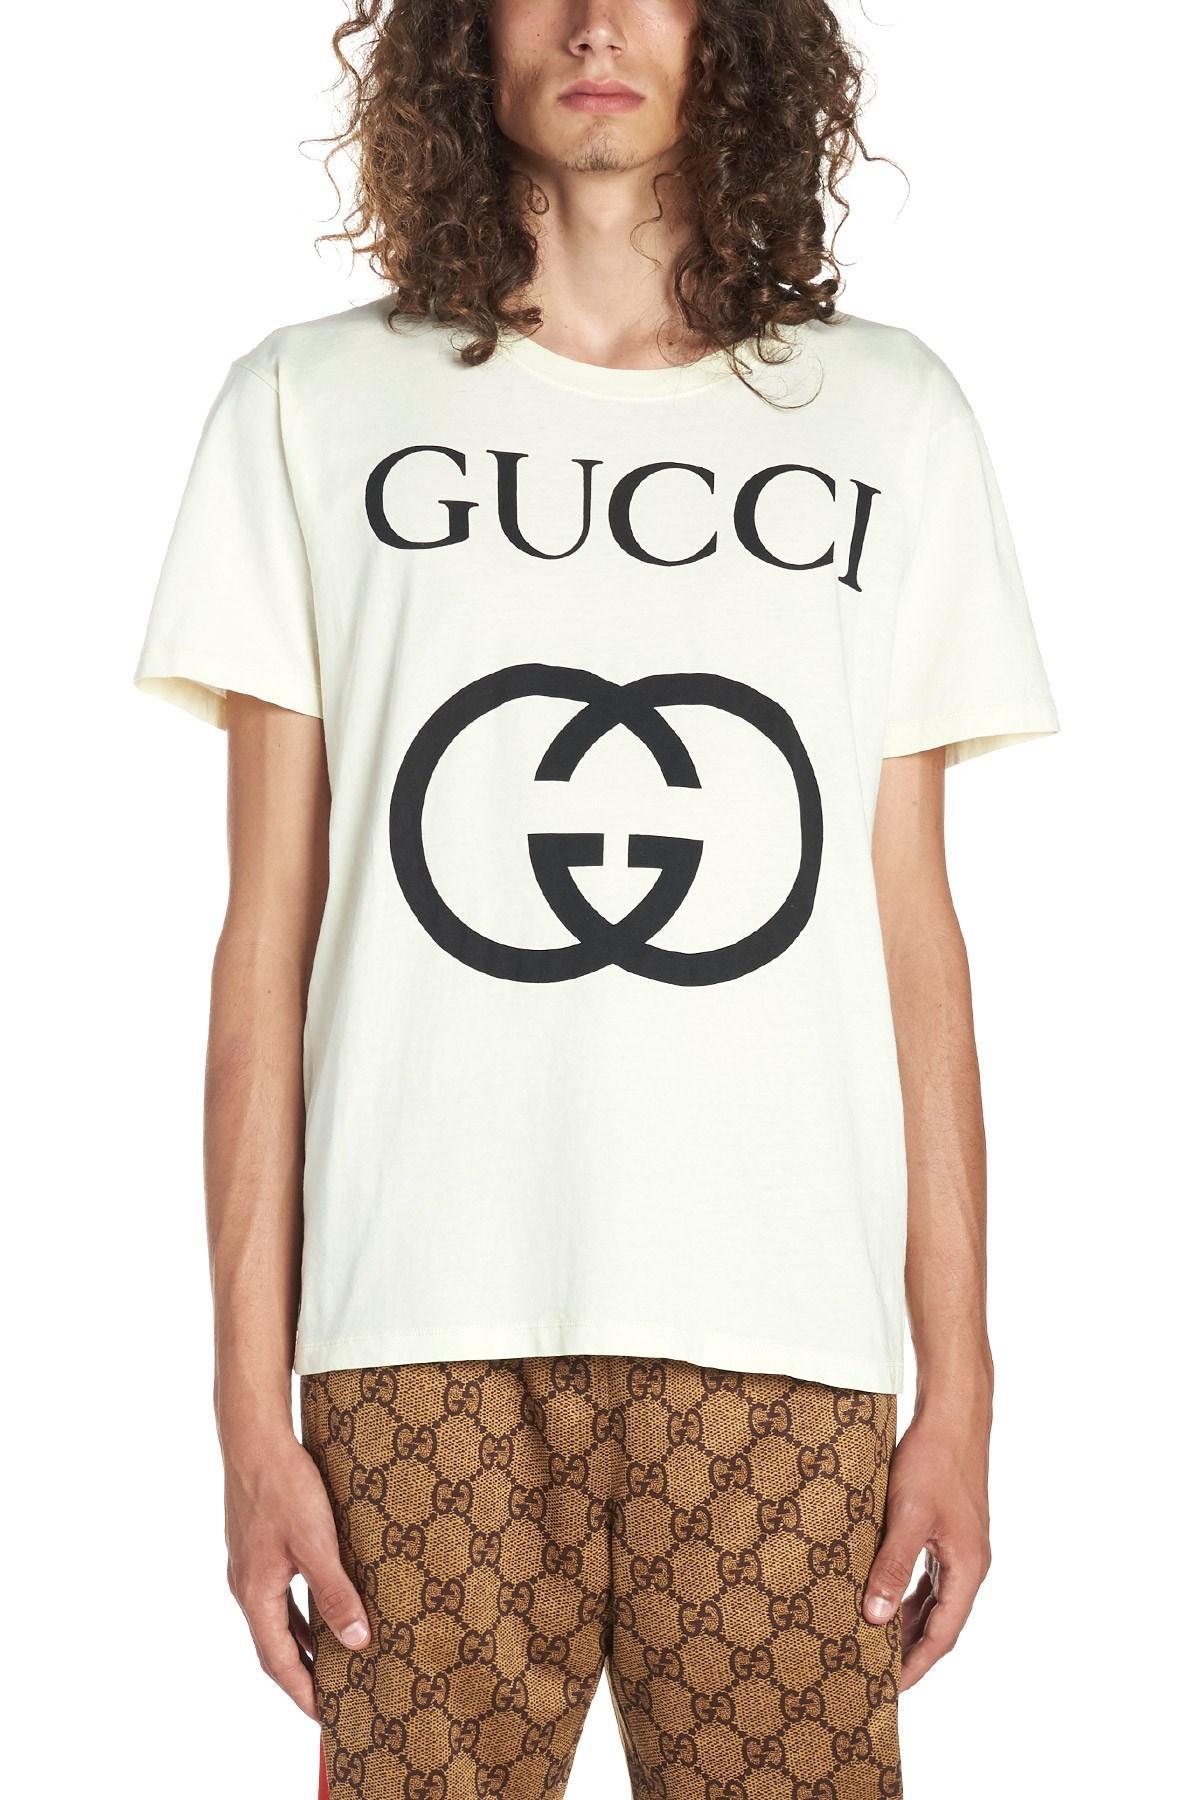 9faf2613f Gucci 'interlocking G' T-shirt in White for Men - Lyst